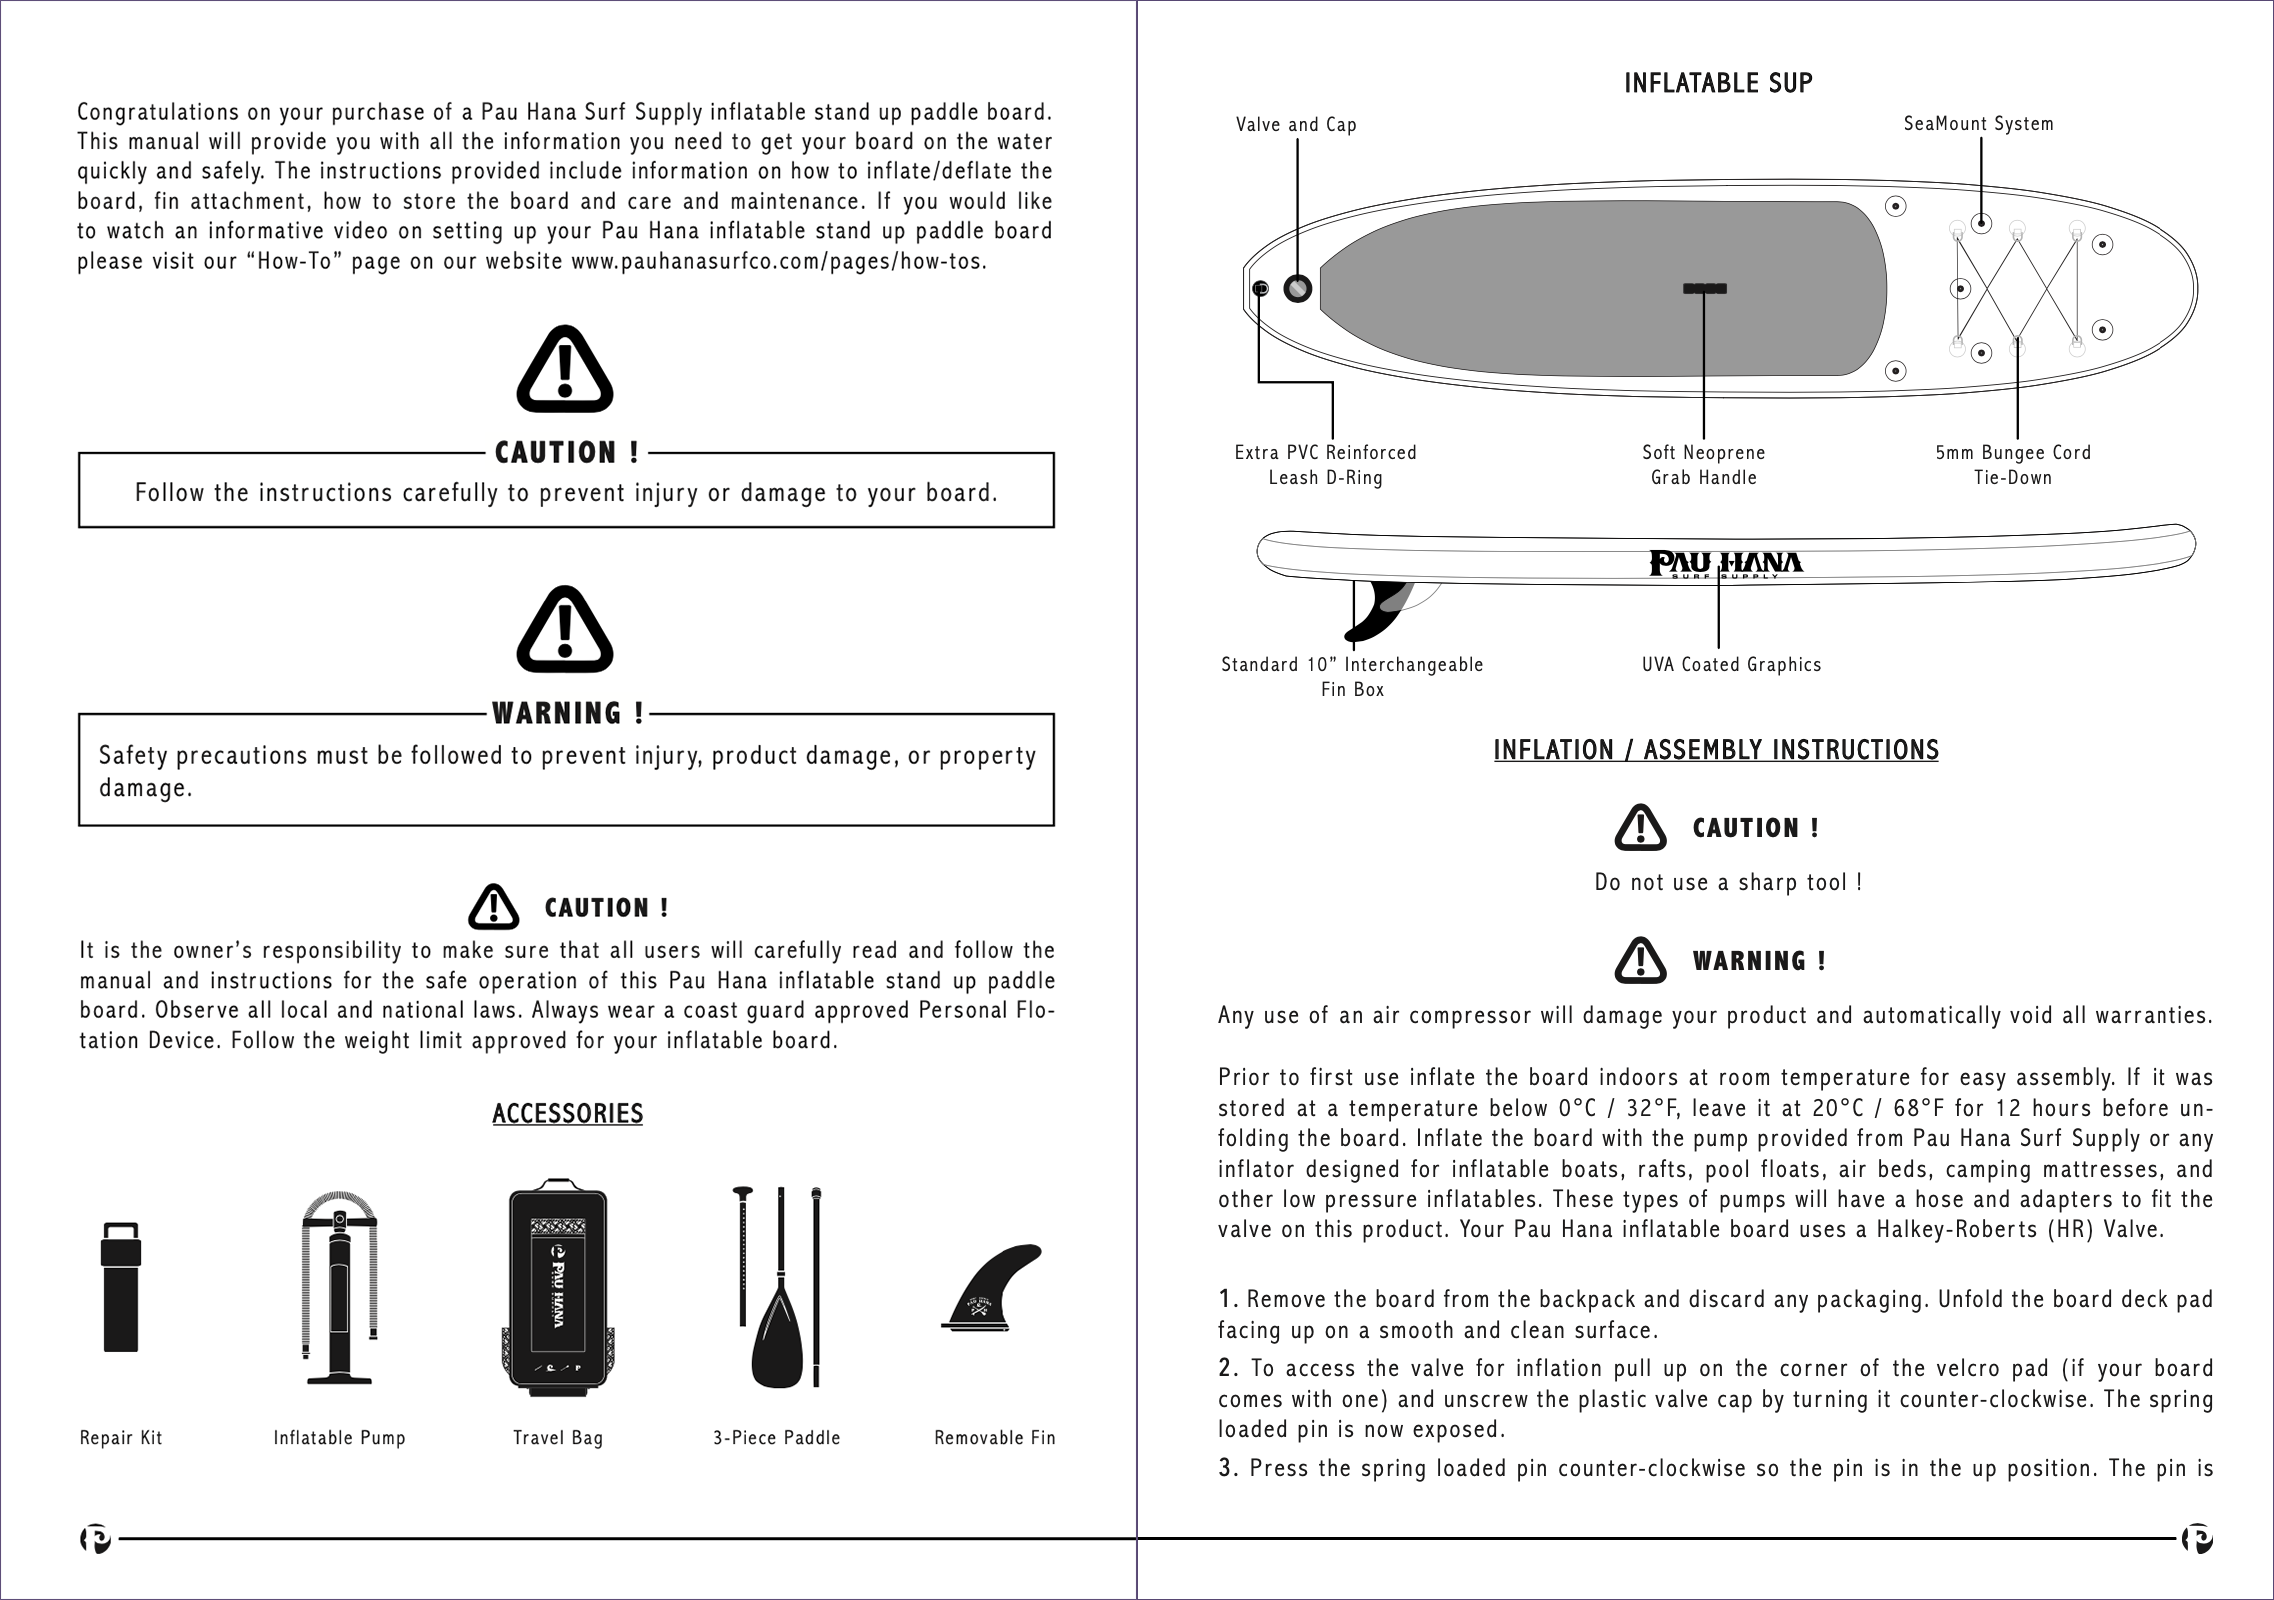 pau hana inflatable stand up paddle board user manual page 2-3